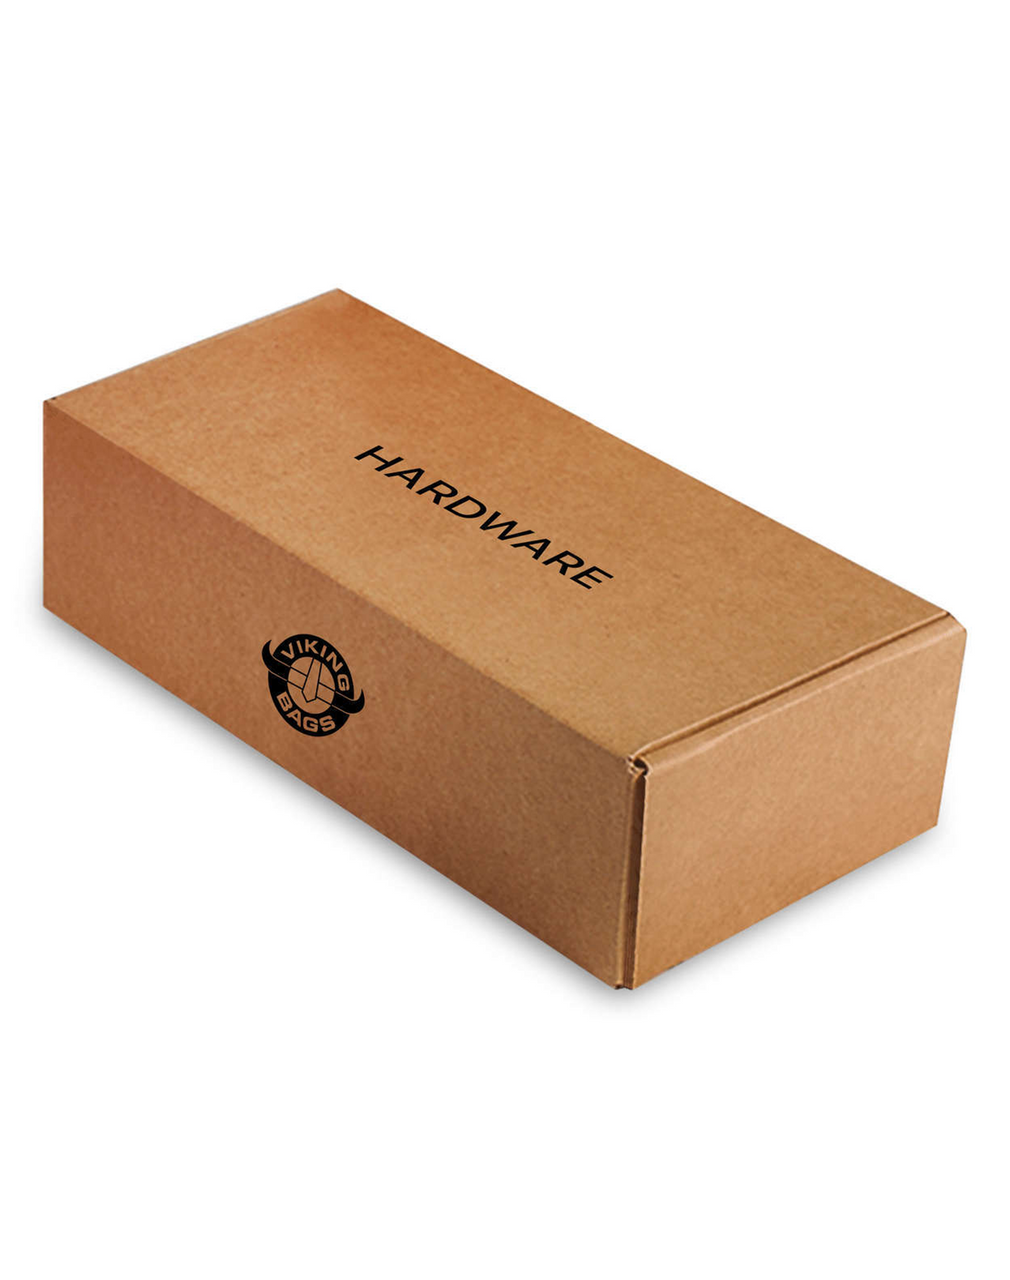 Honda VTX 1300 C Lamellar Extra Large Shock Cutout Saddlebag Hardware Box